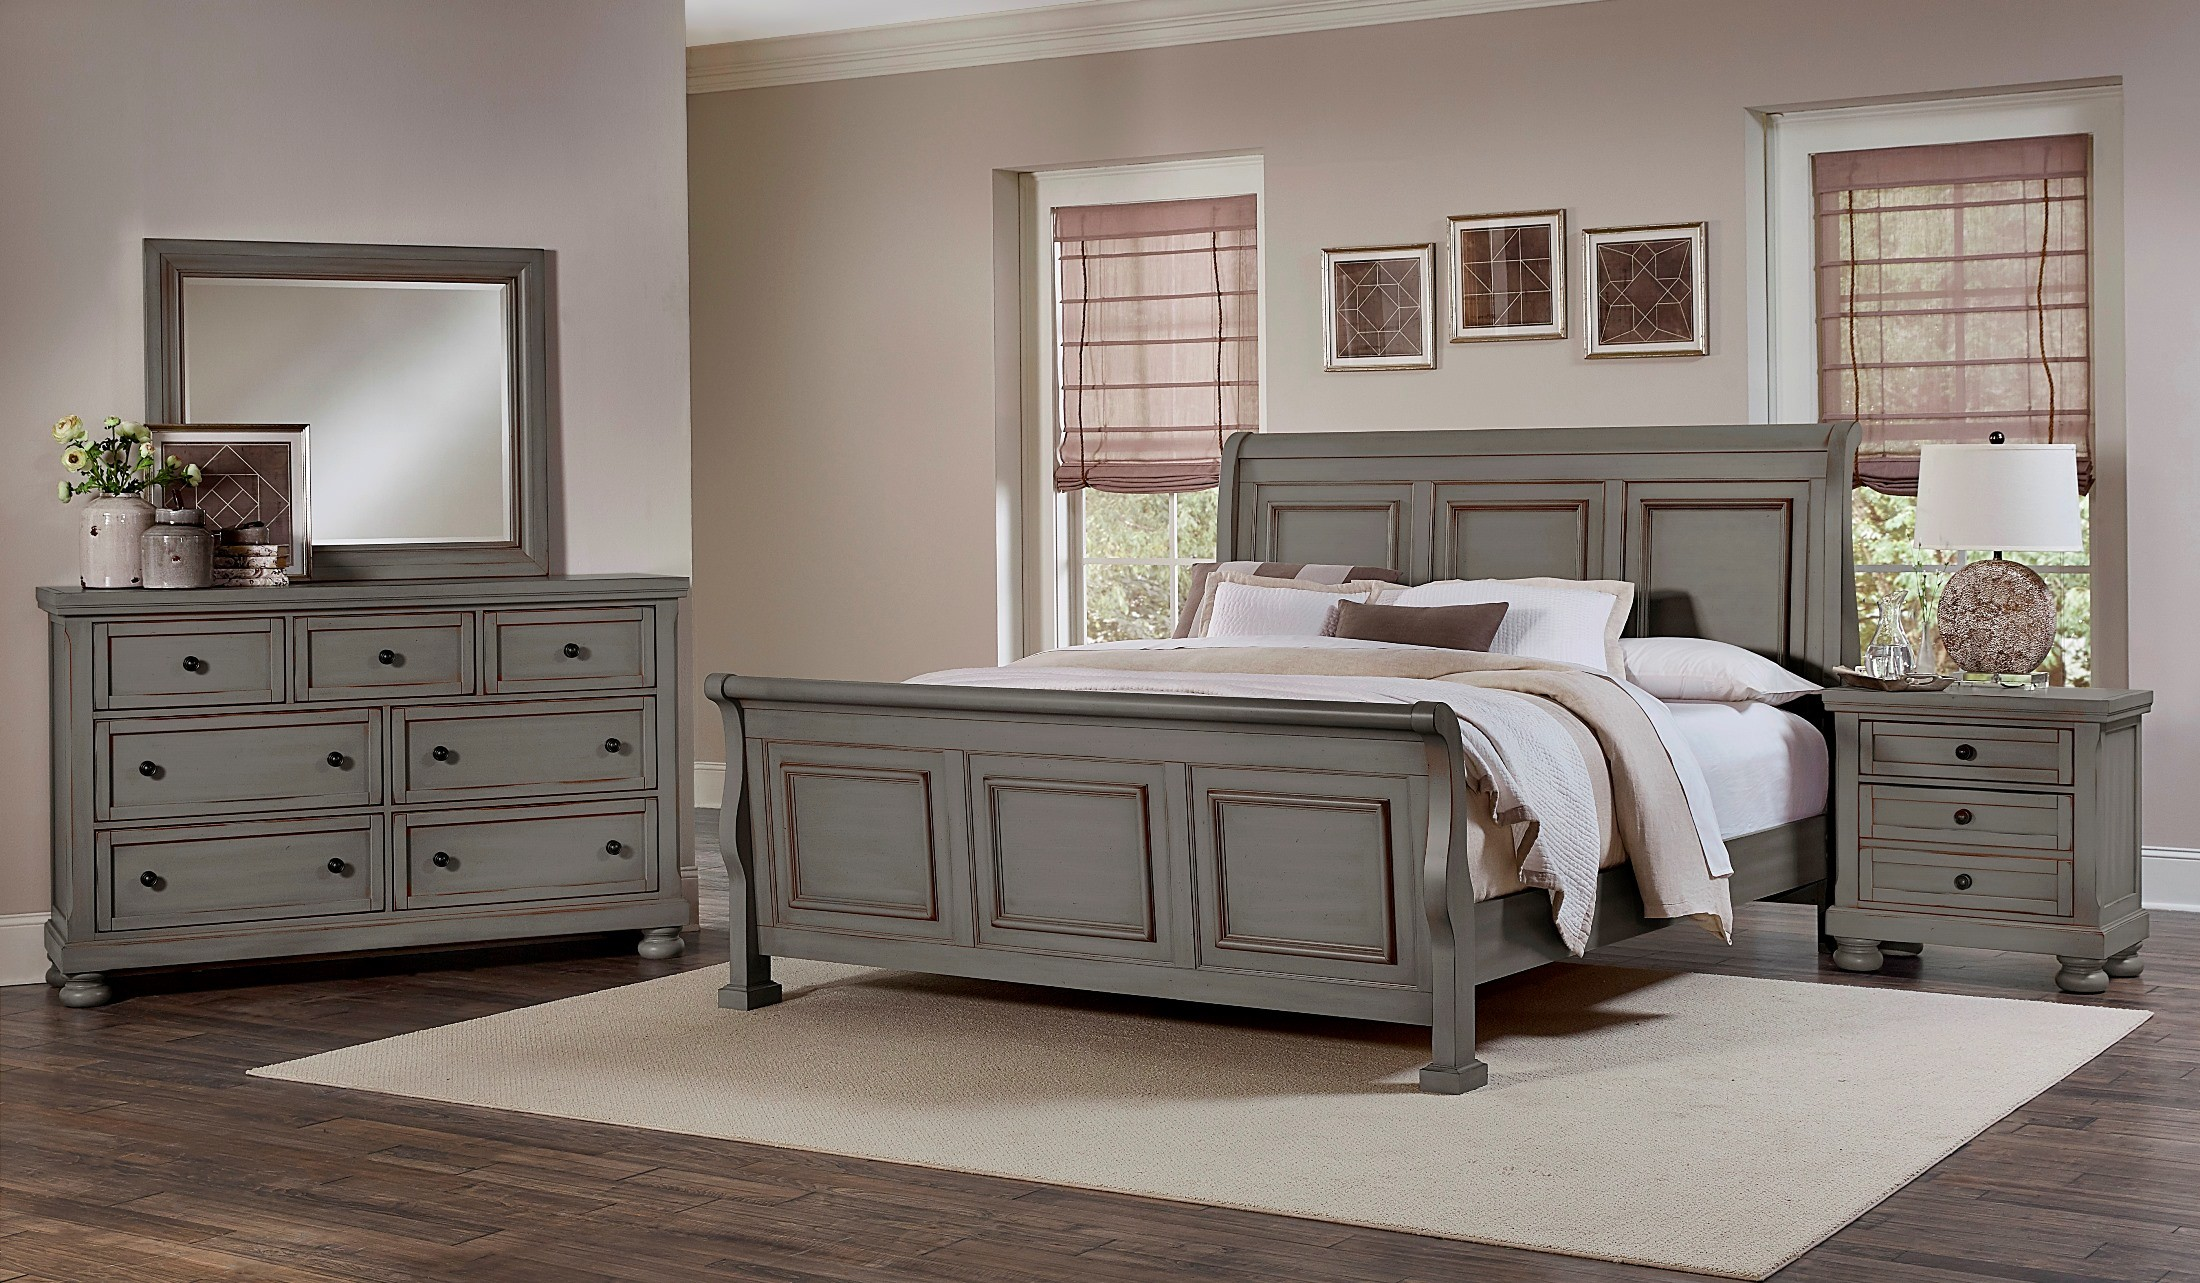 bassett bedroom sets. 1803657 Reflections Antique Pewter 7 Drawer Triple Dresser from Virginia